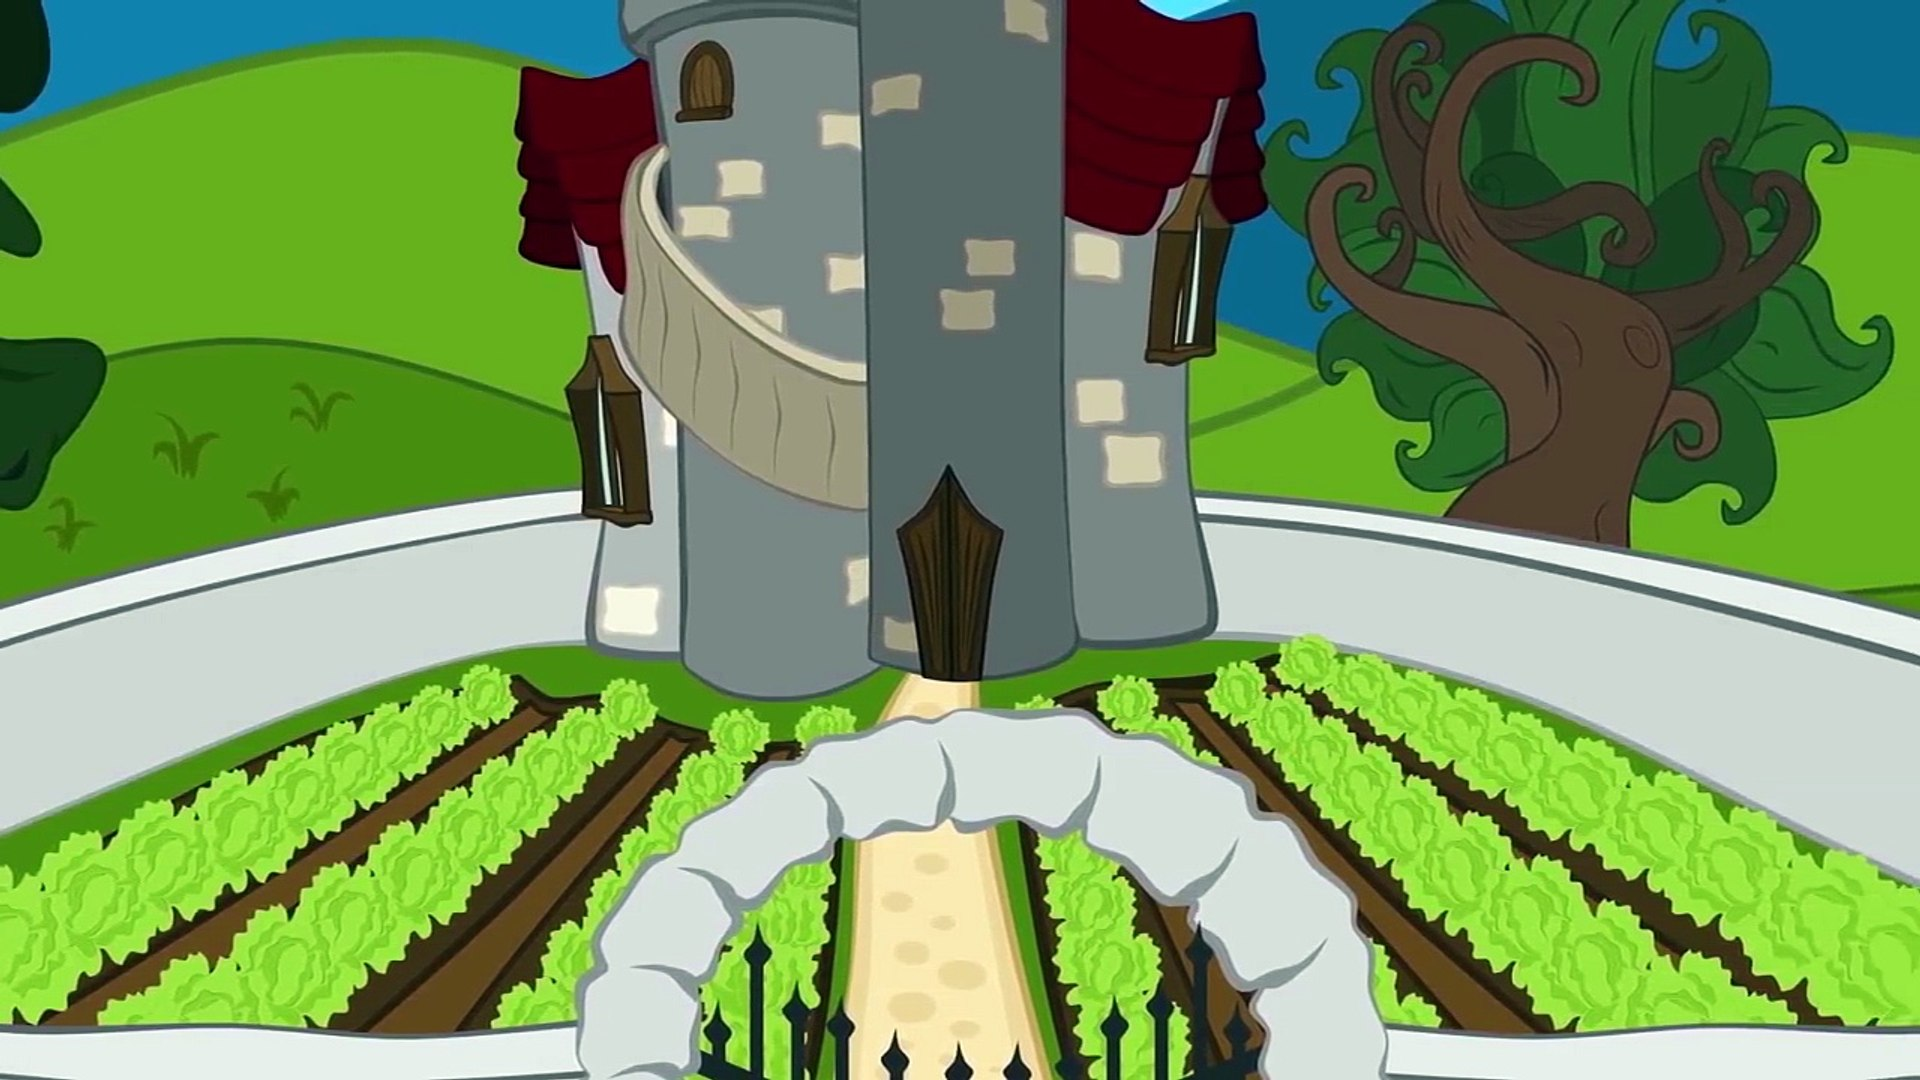 Rapunzel Cerita Untuk Anak Anak Animasi Kartun Stories For Children In Indonesian Gesffr1hguy Video Dailymotion